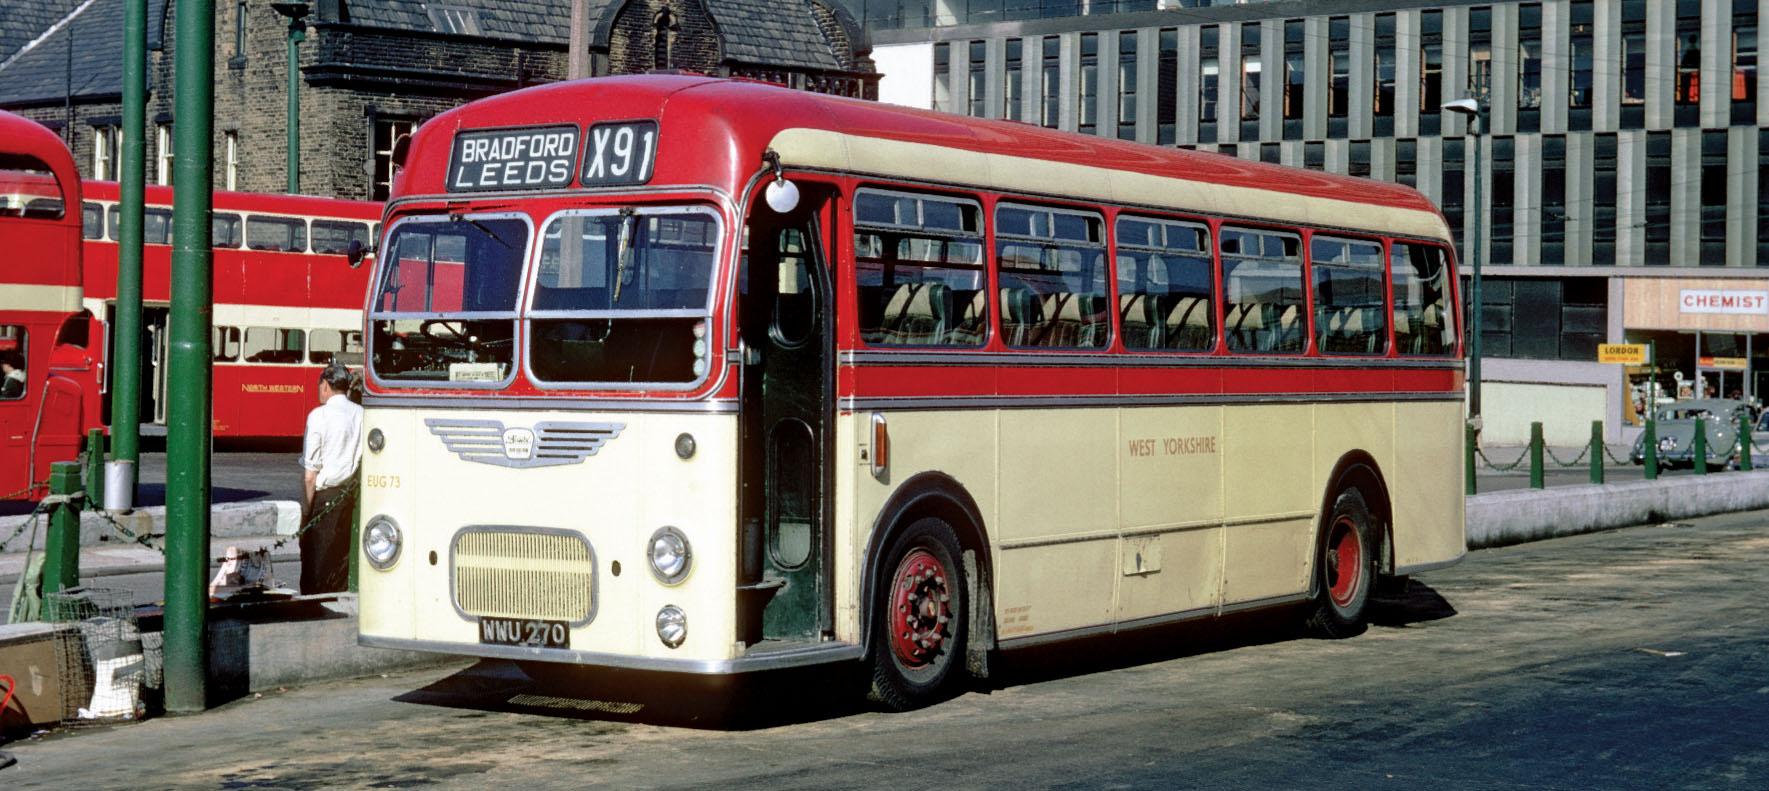 Bradford Chester Street bus station